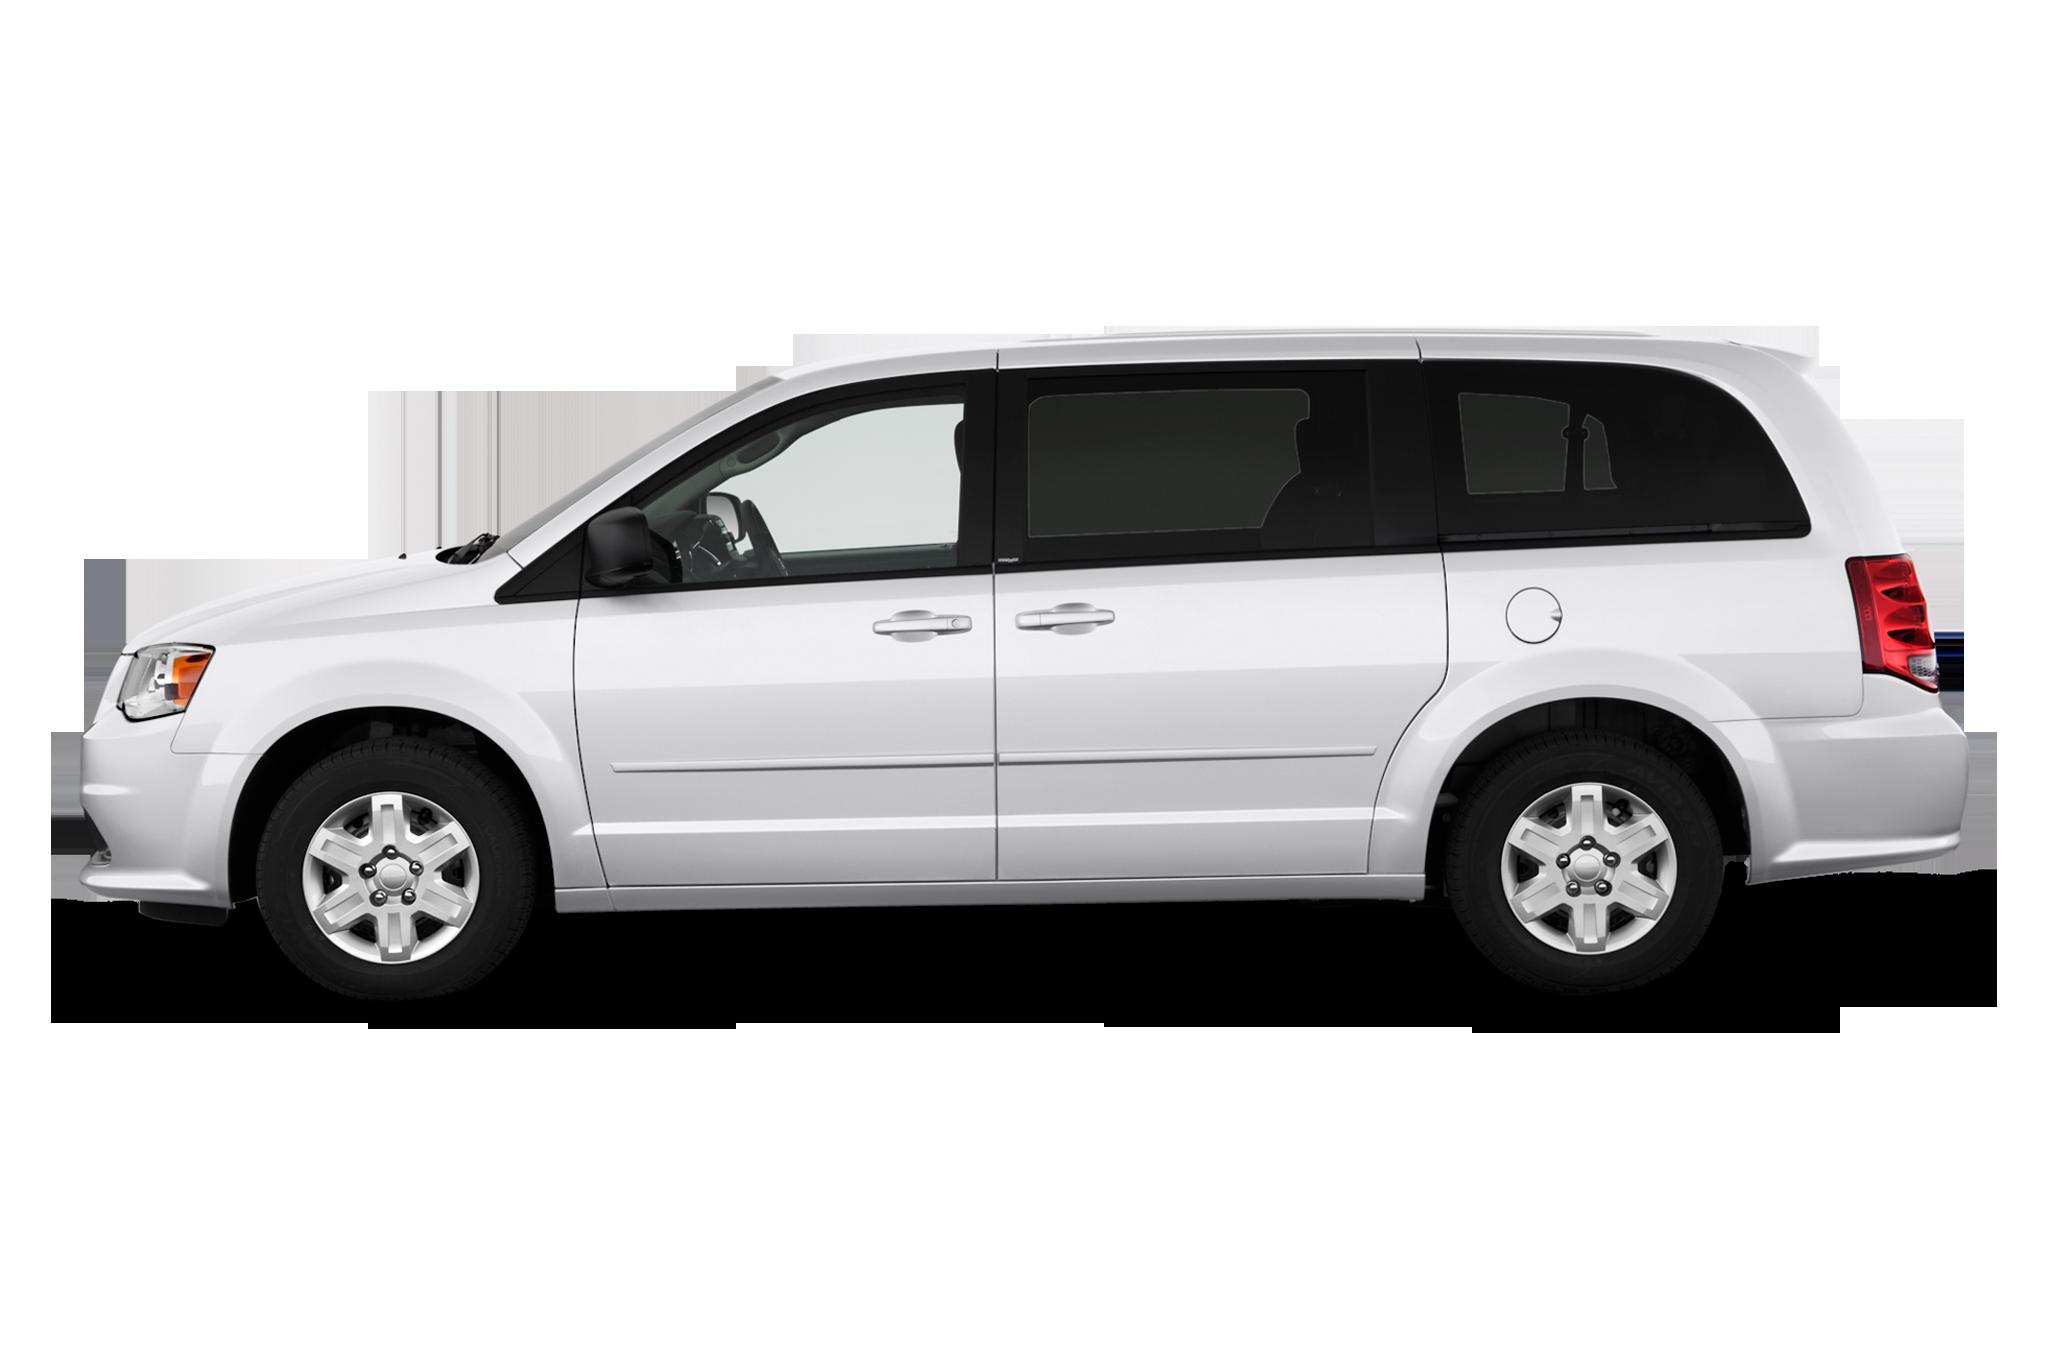 owned fwd sxt mini used dodge caravan pre grand van in passenger inventory